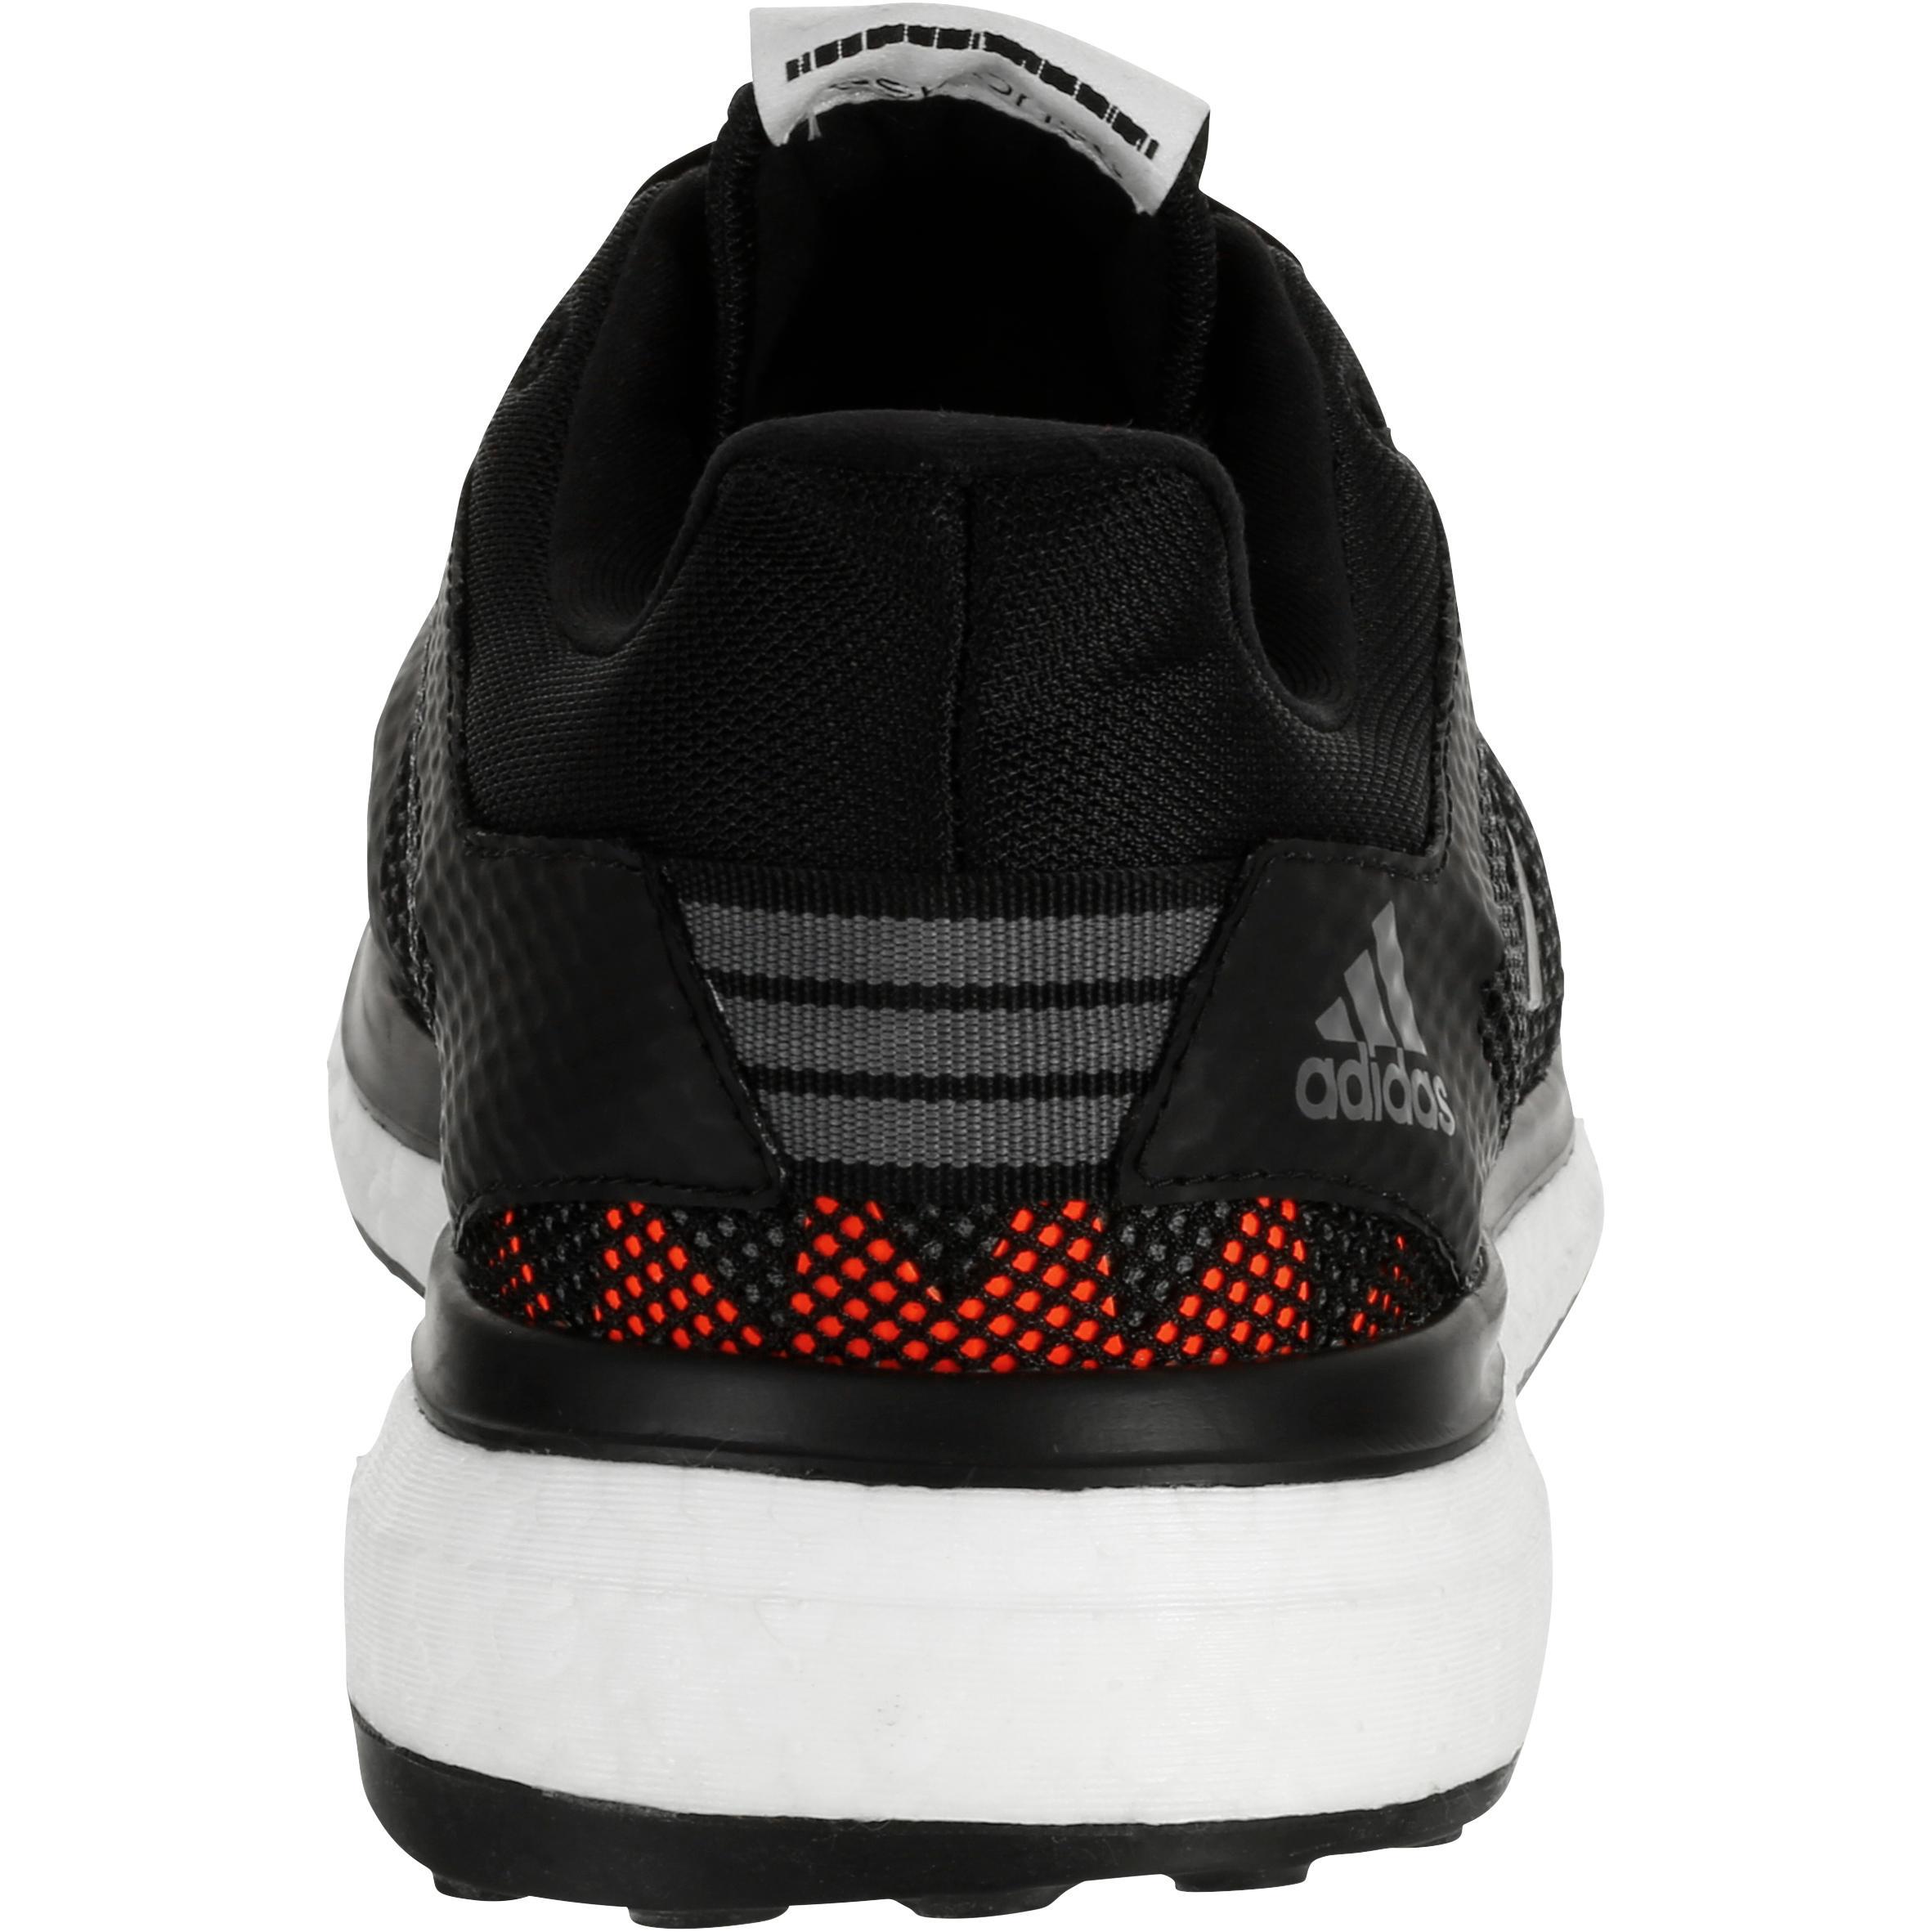 Noir Jt1fkcl Homme Boost Running Plus Adidas Response Chaussures A5qj4RLc3S